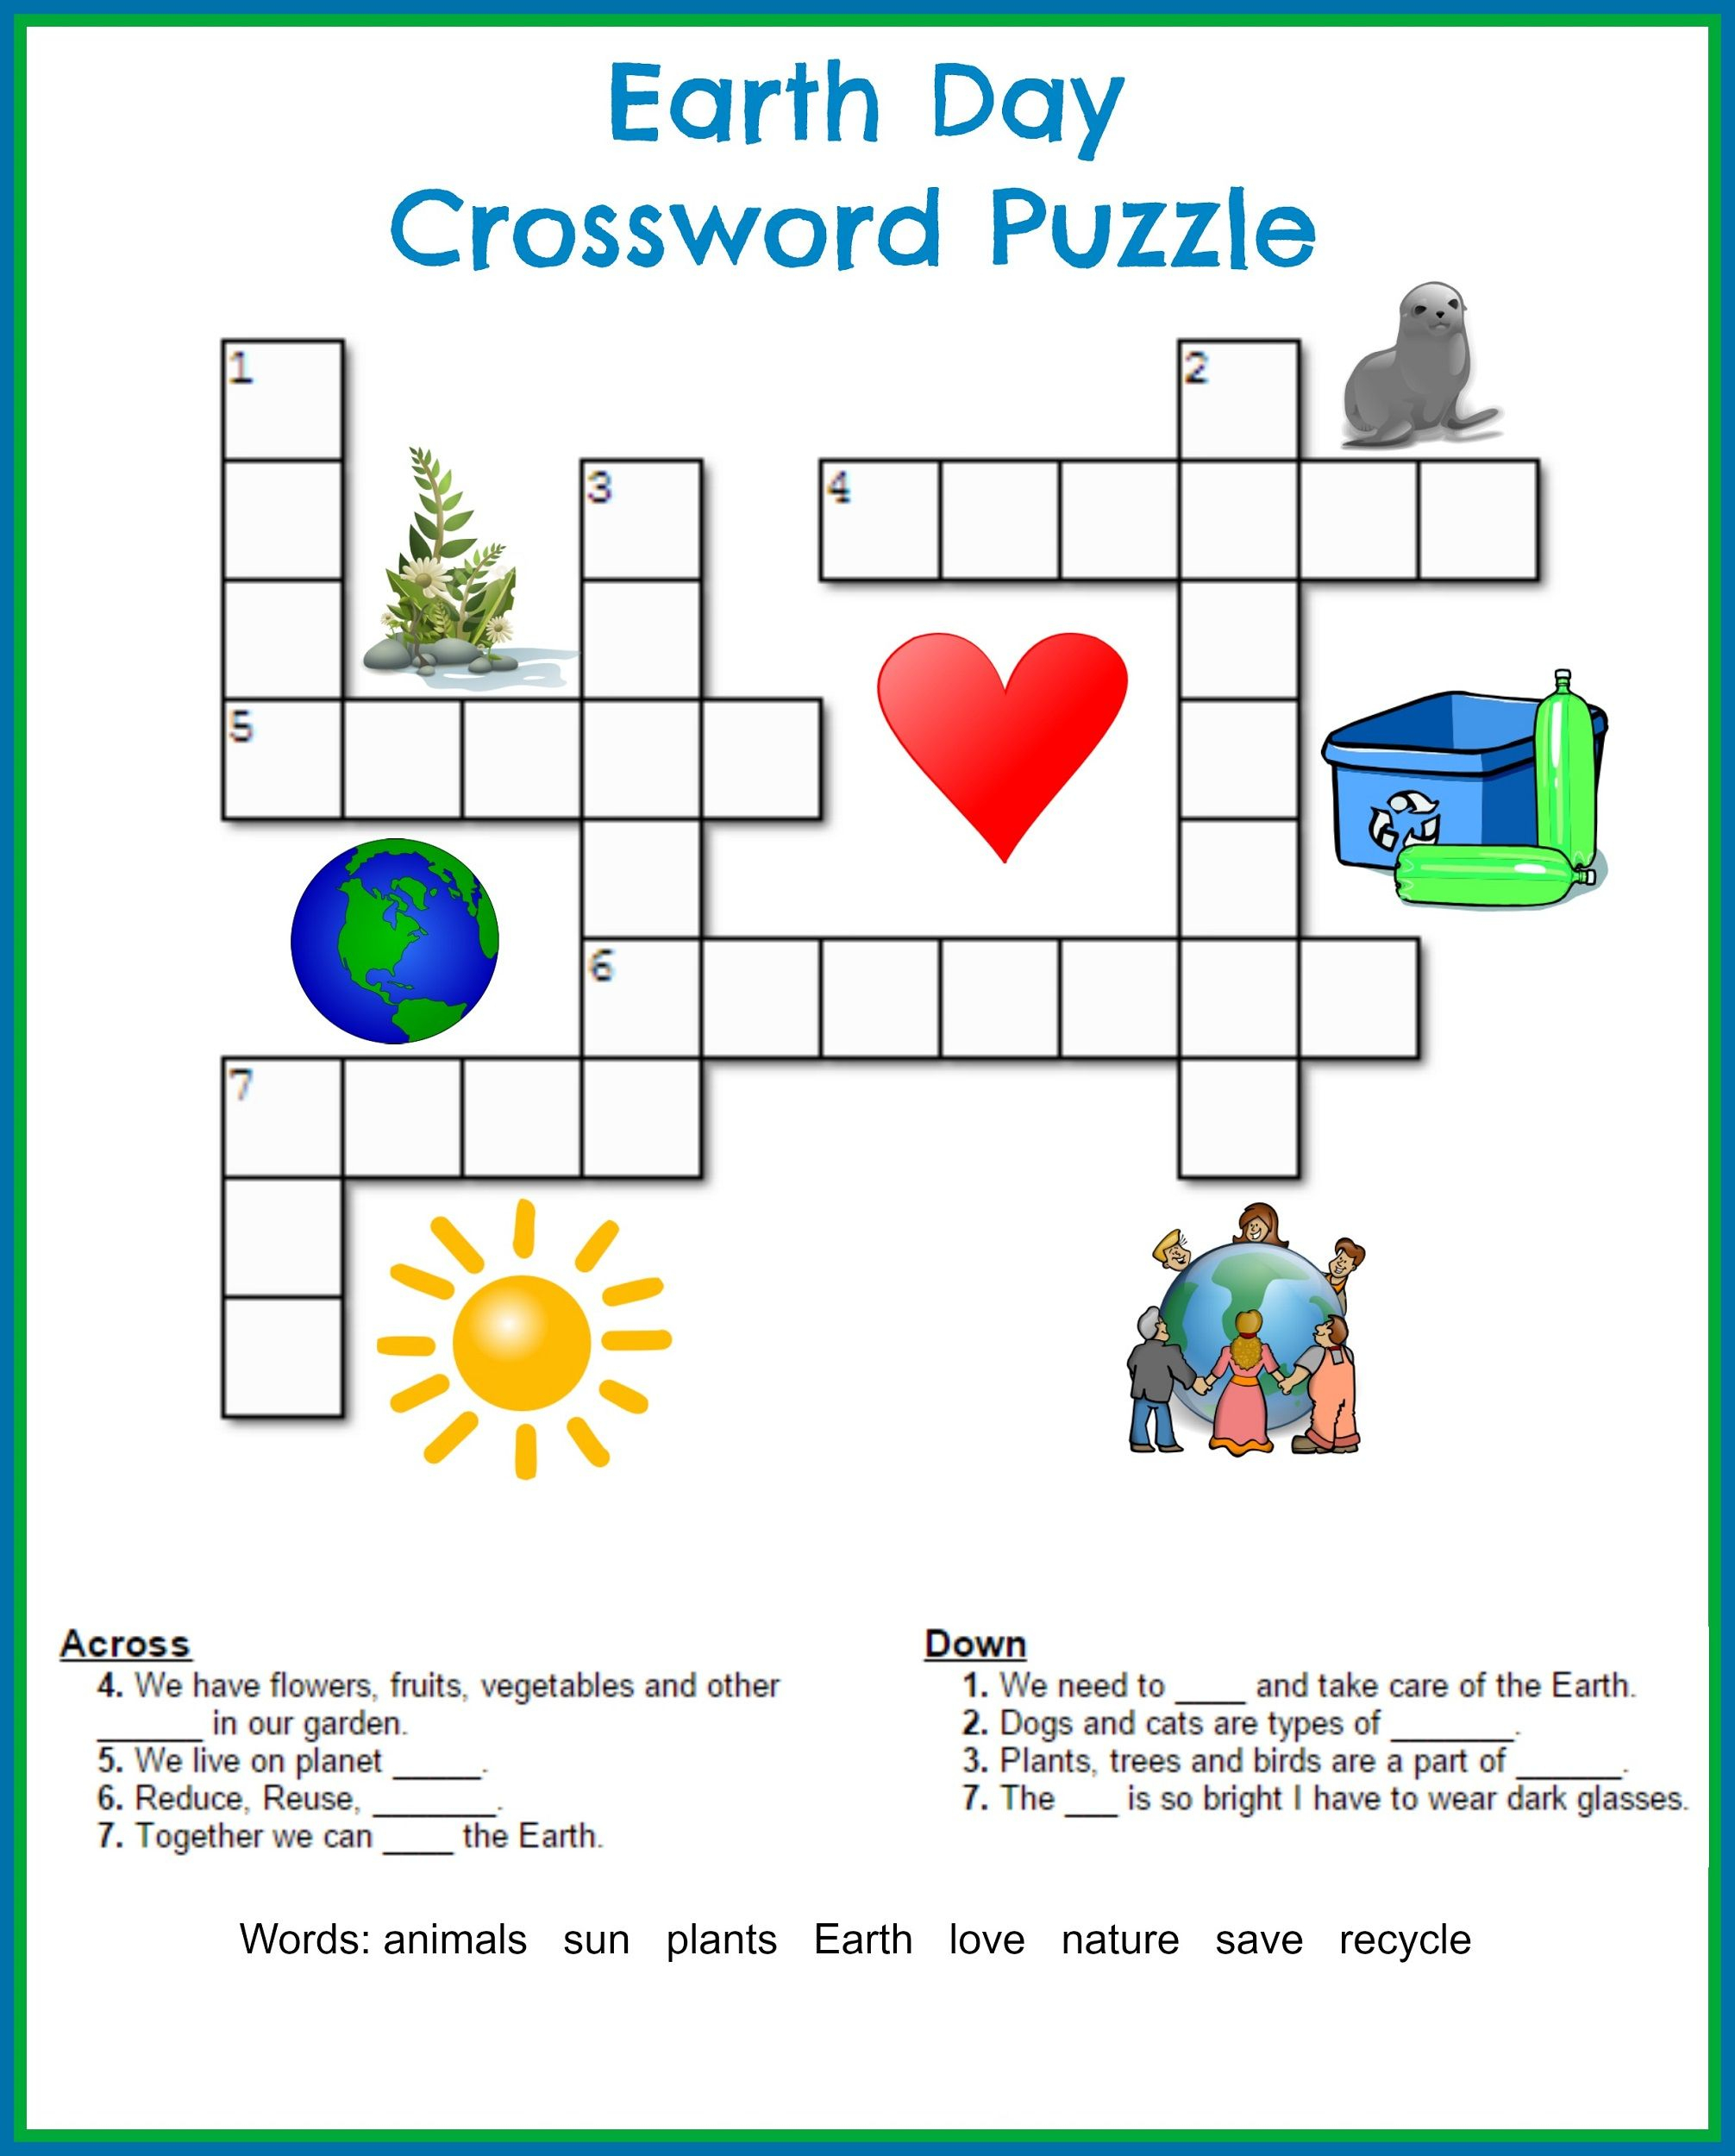 Printable Crossword Puzzles Kids | Crossword Puzzles On Earth - Printable Crossword Puzzle For Grade 2